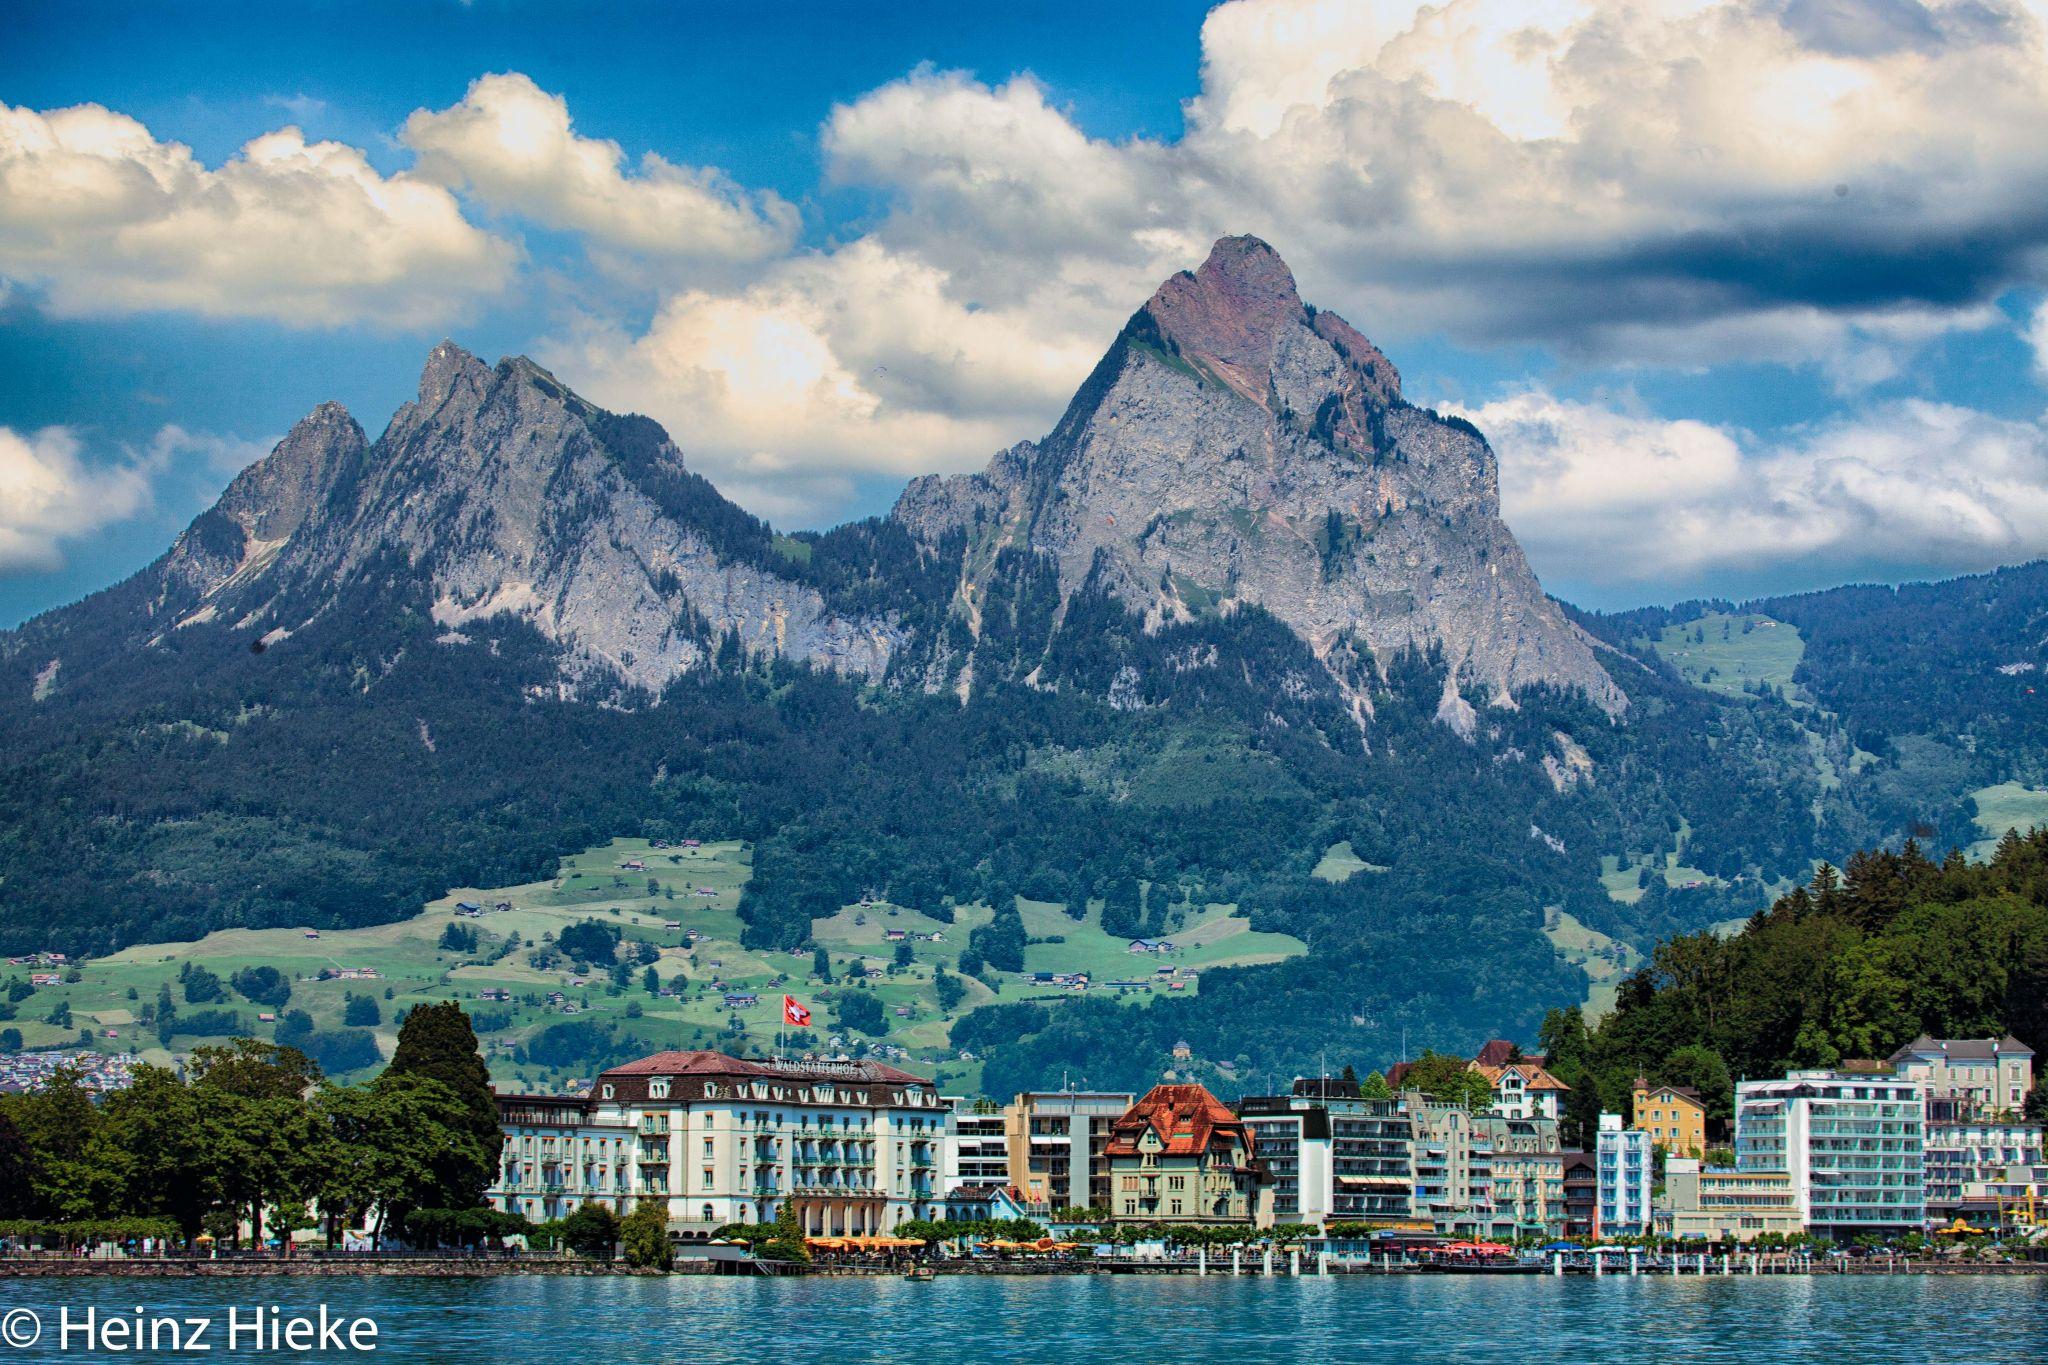 Mythen, Switzerland